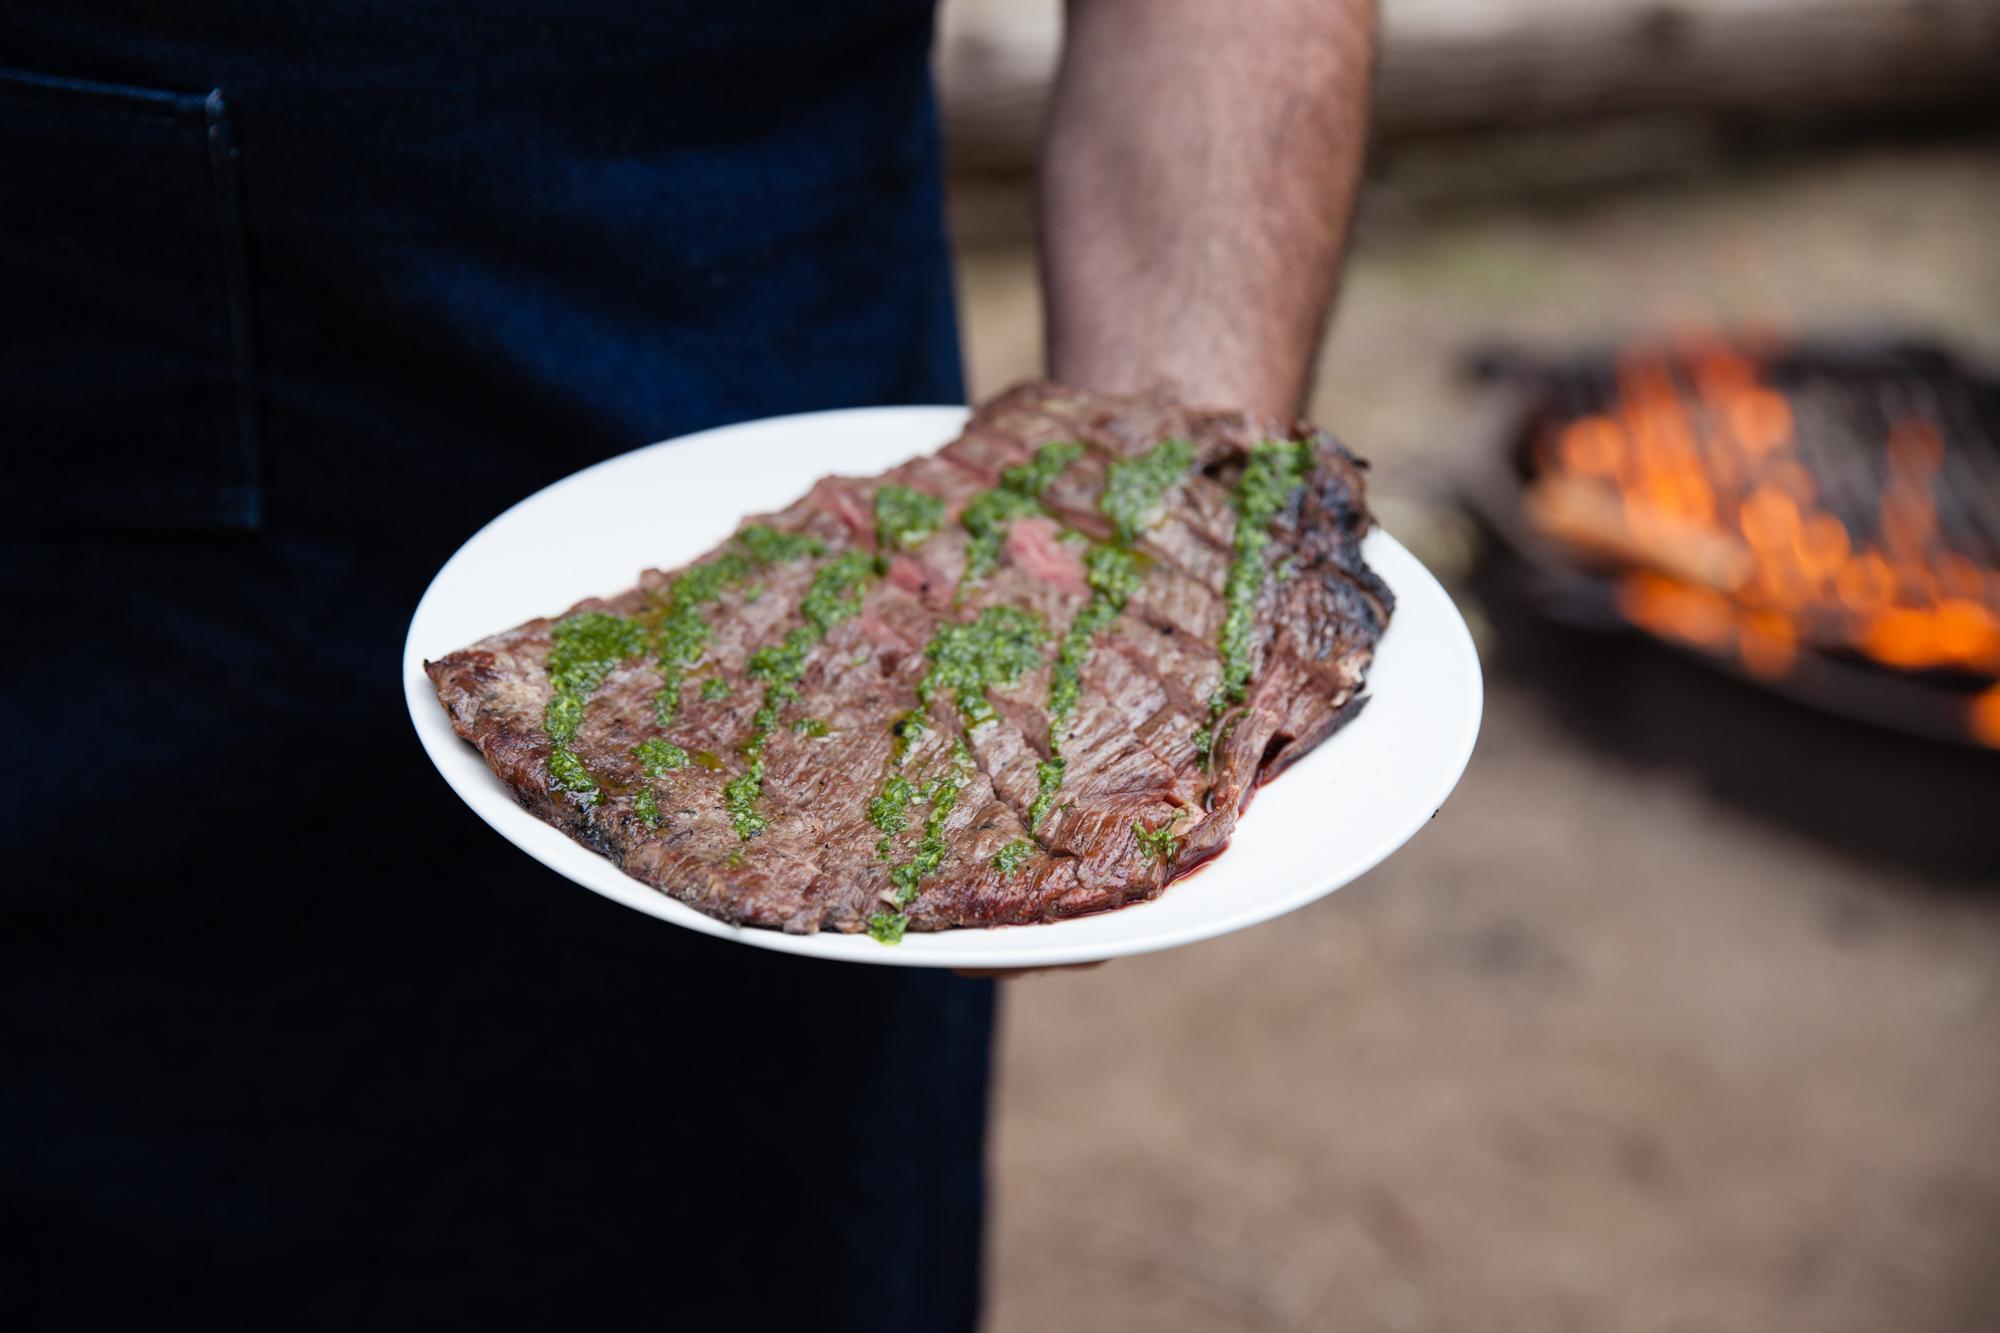 Fire Roasted Flank Steak with Chimichurri